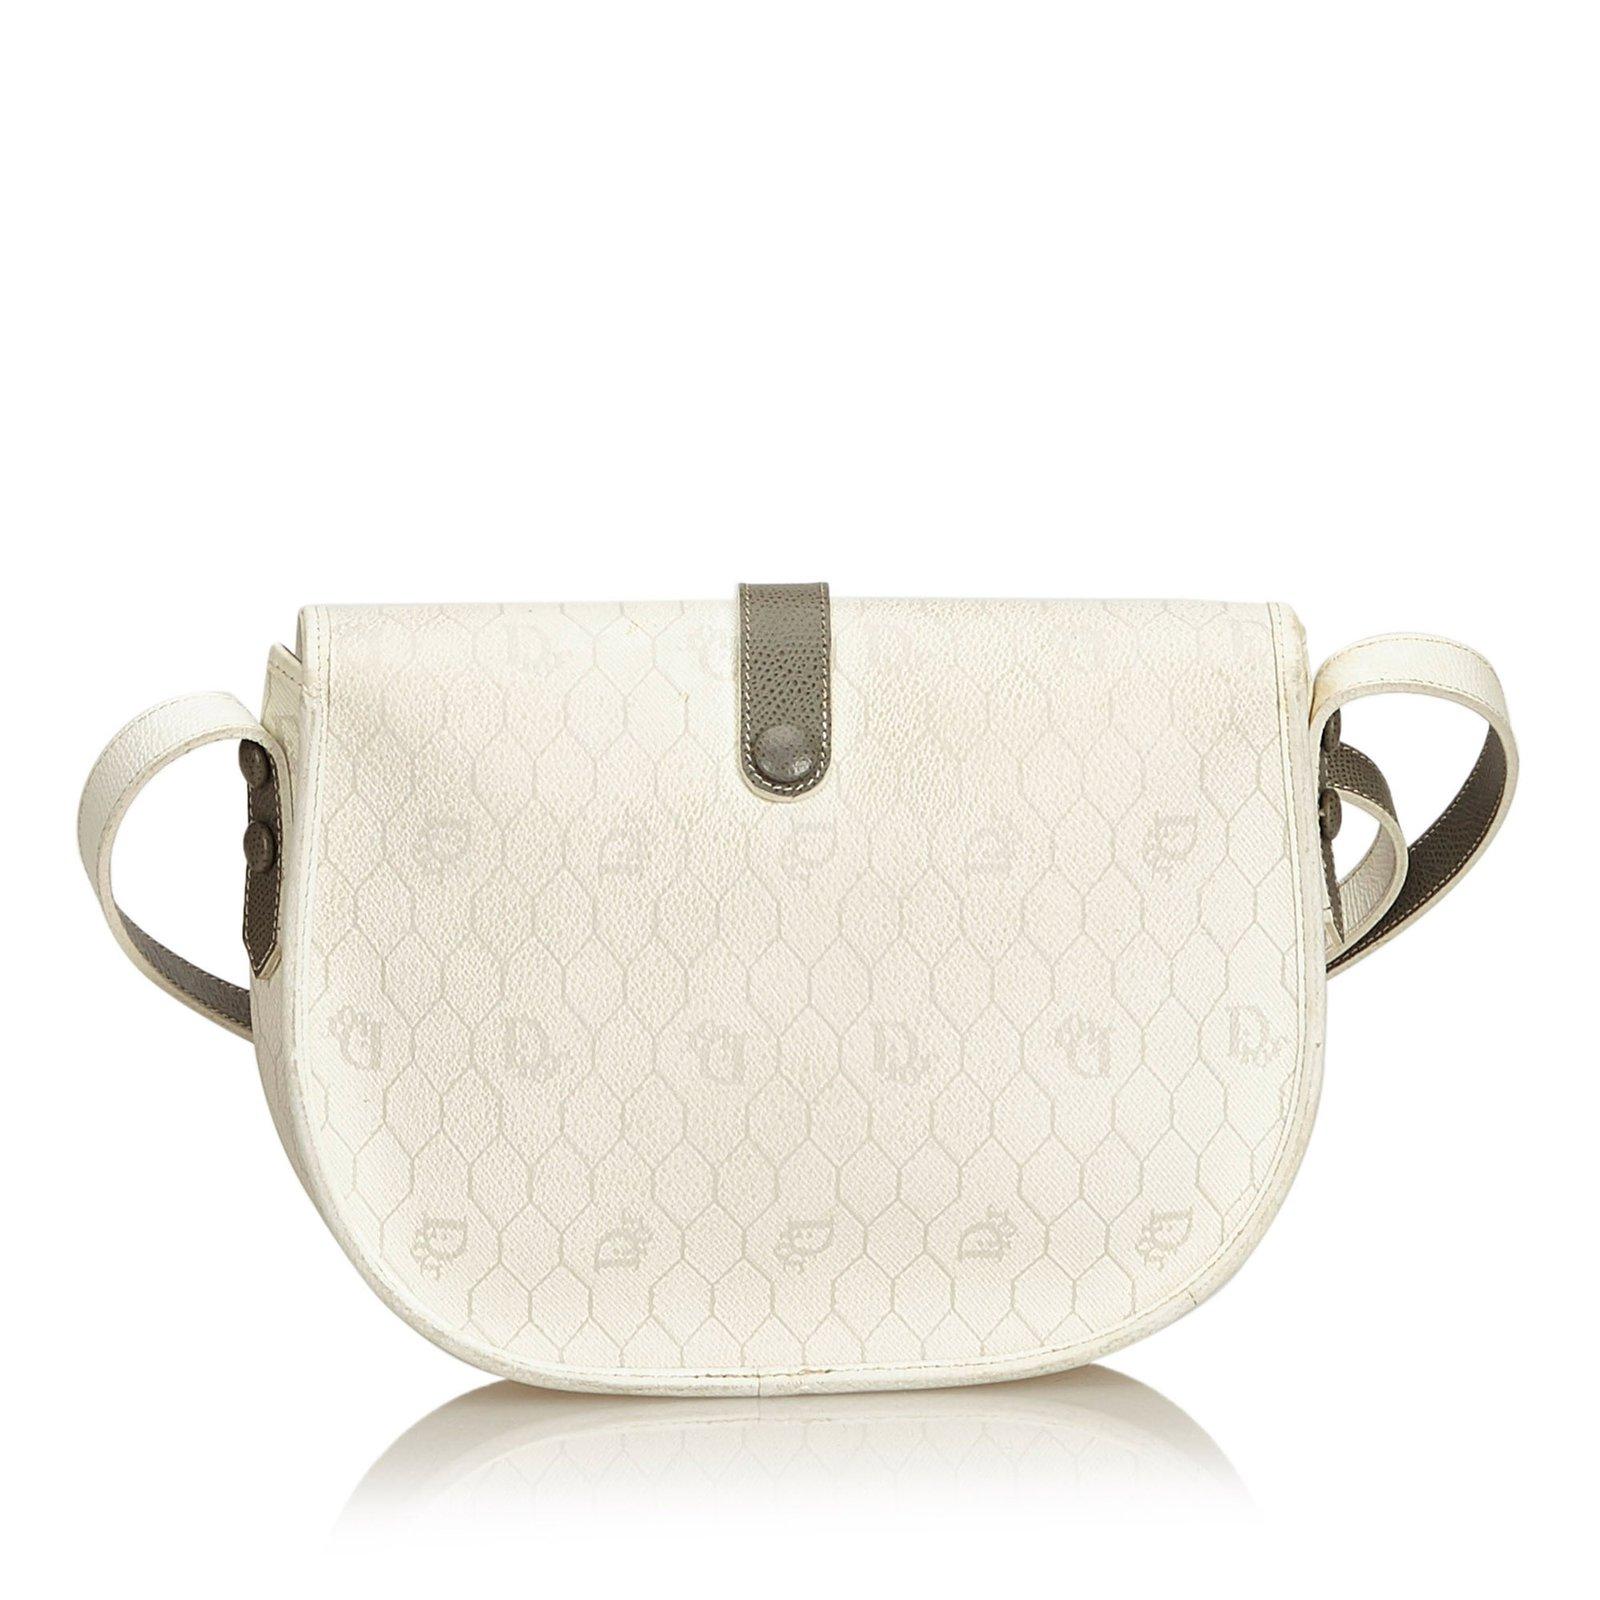 Dior Honeycomb Coated Canvas Crossbody Bag Handbags  Leather,Other,Cloth,Cloth White,Other,Grey,Cream ref.91547 - Joli Closet 81605b2a7c